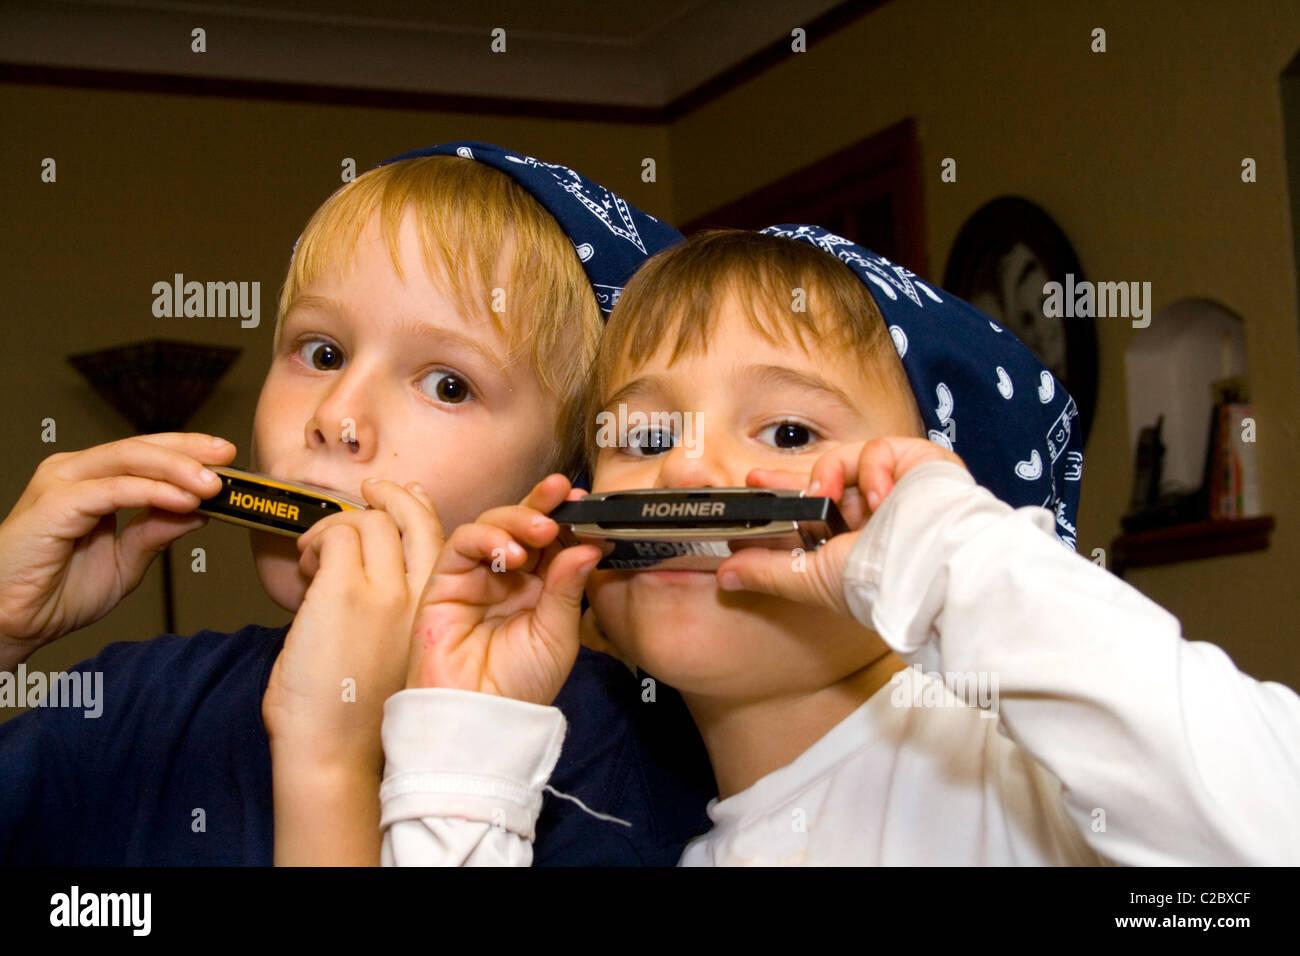 Brothers age 5 and 8 wearing bandanas and playing harmonicas.  St Paul Minnesota MN USA - Stock Image